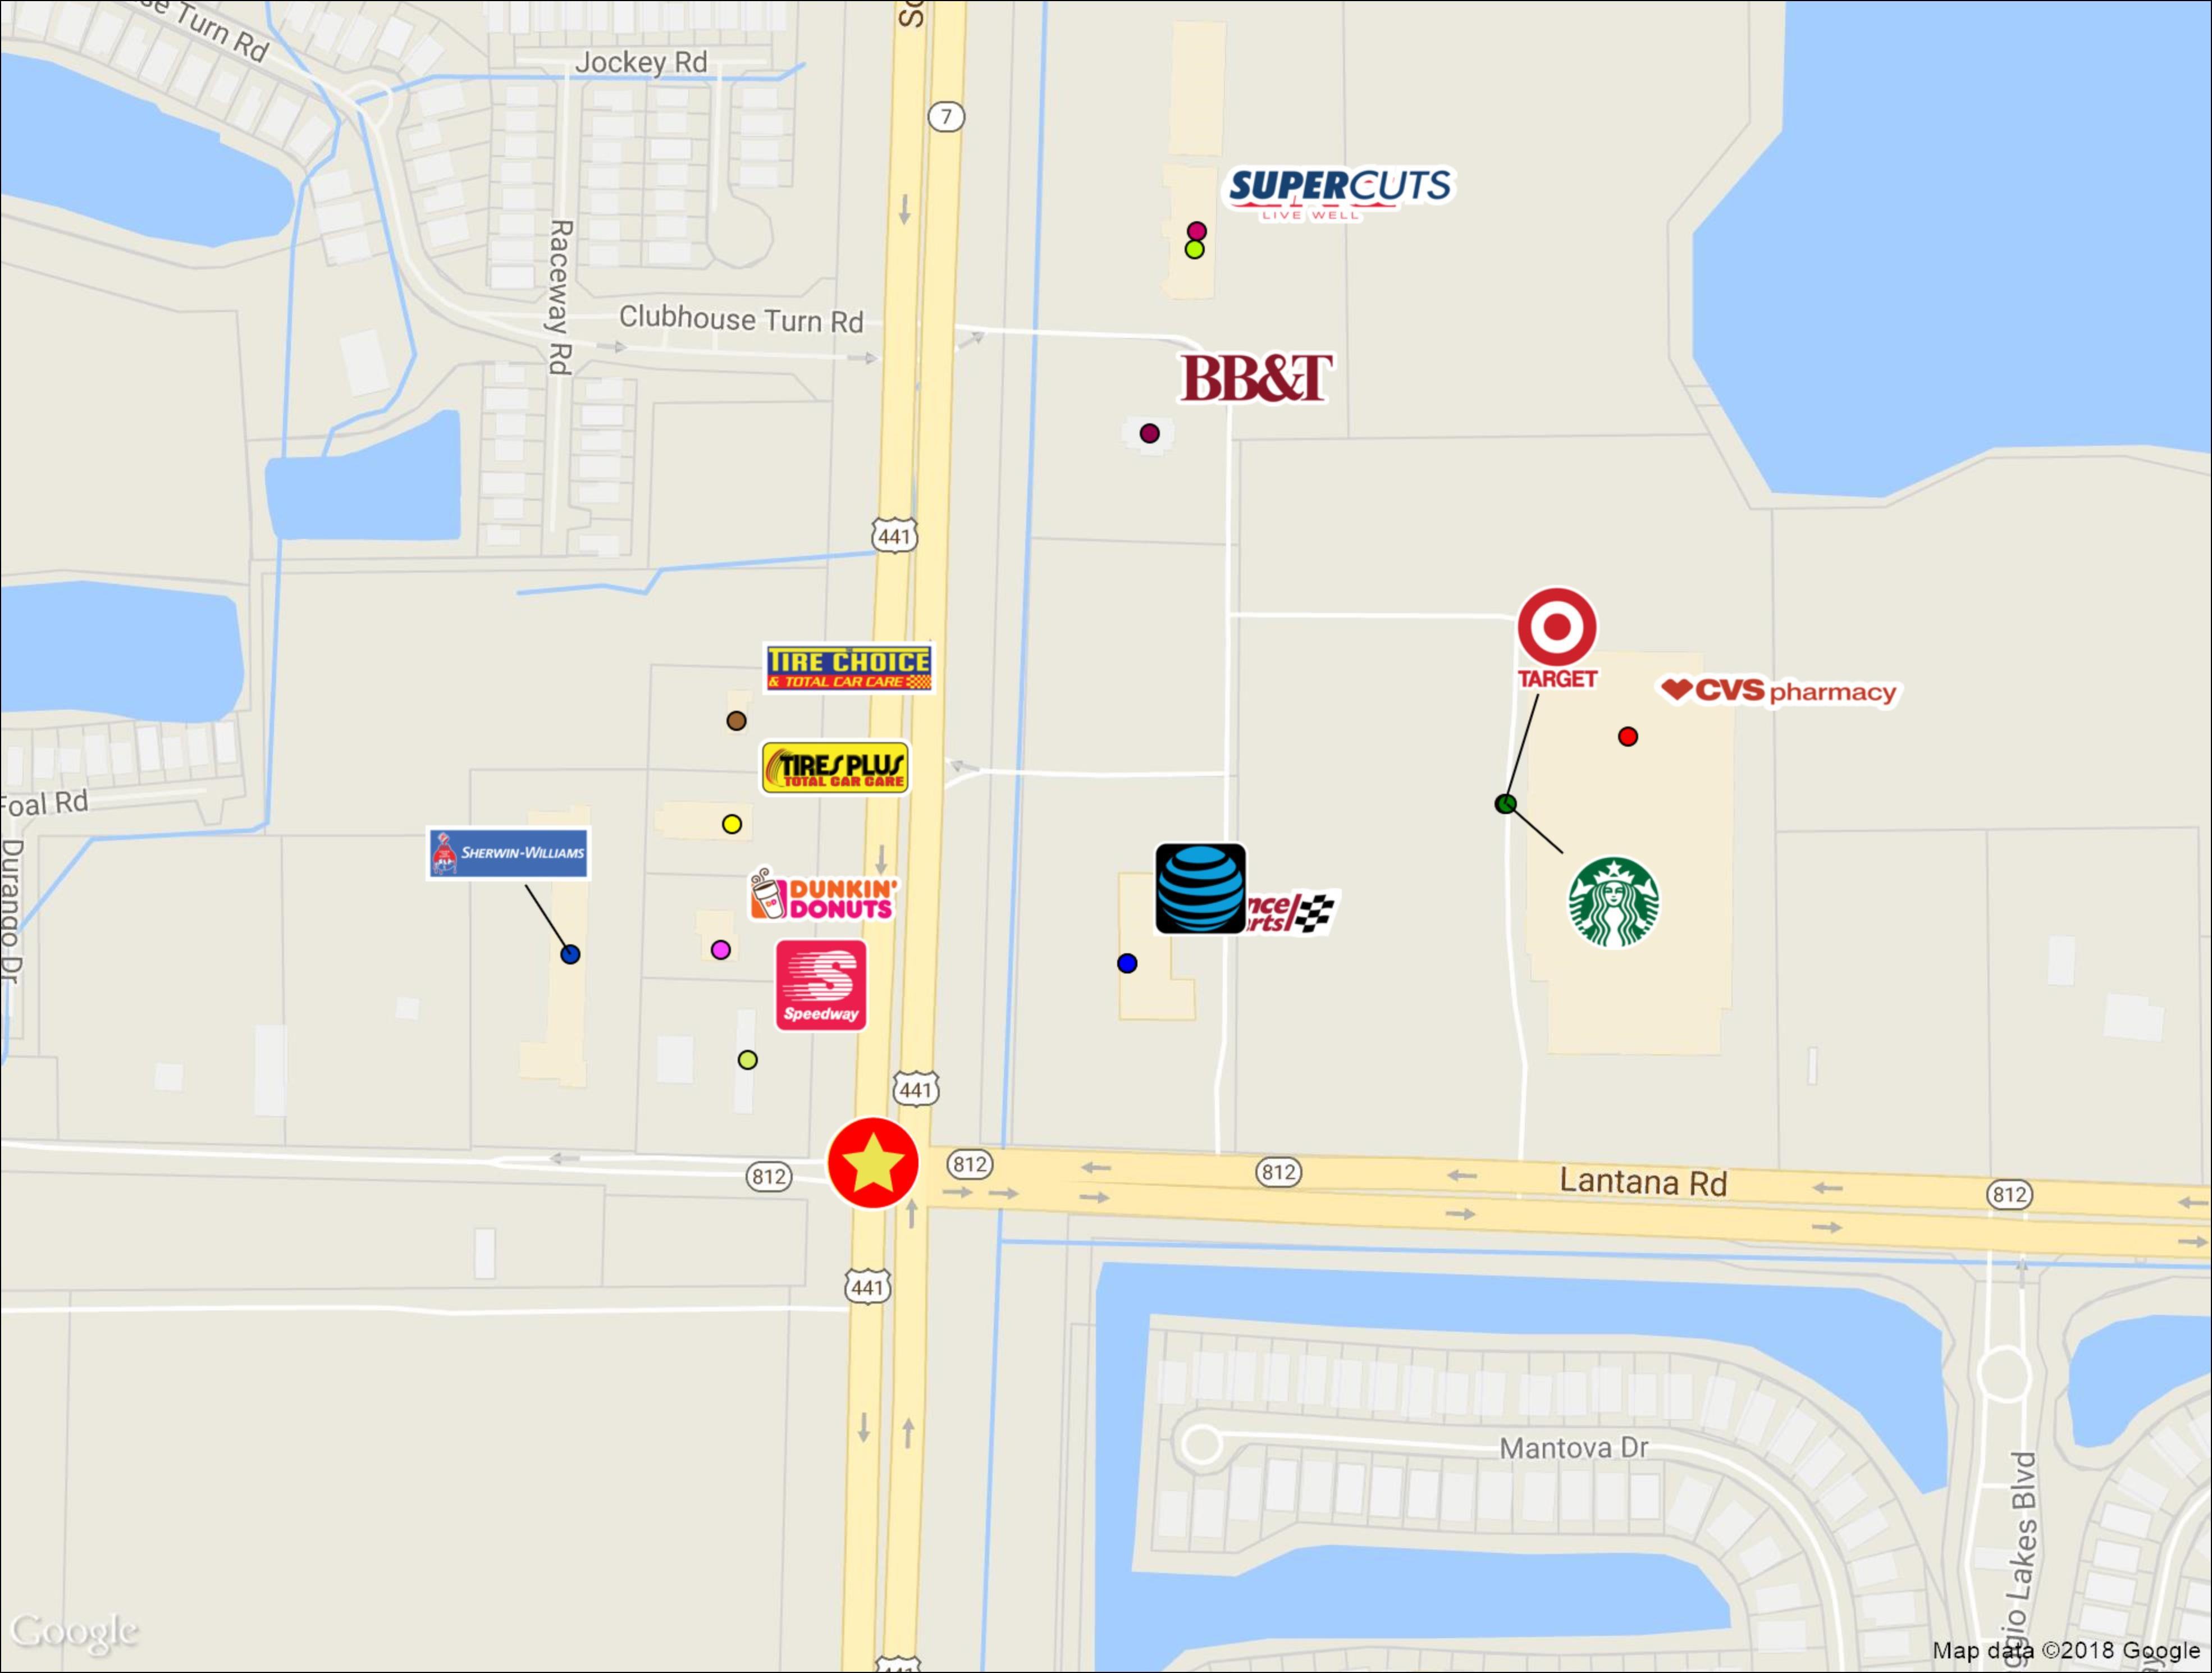 Roberts Equities Llc, Developing Property 441 & Lantana Road. - Lantana Florida Map